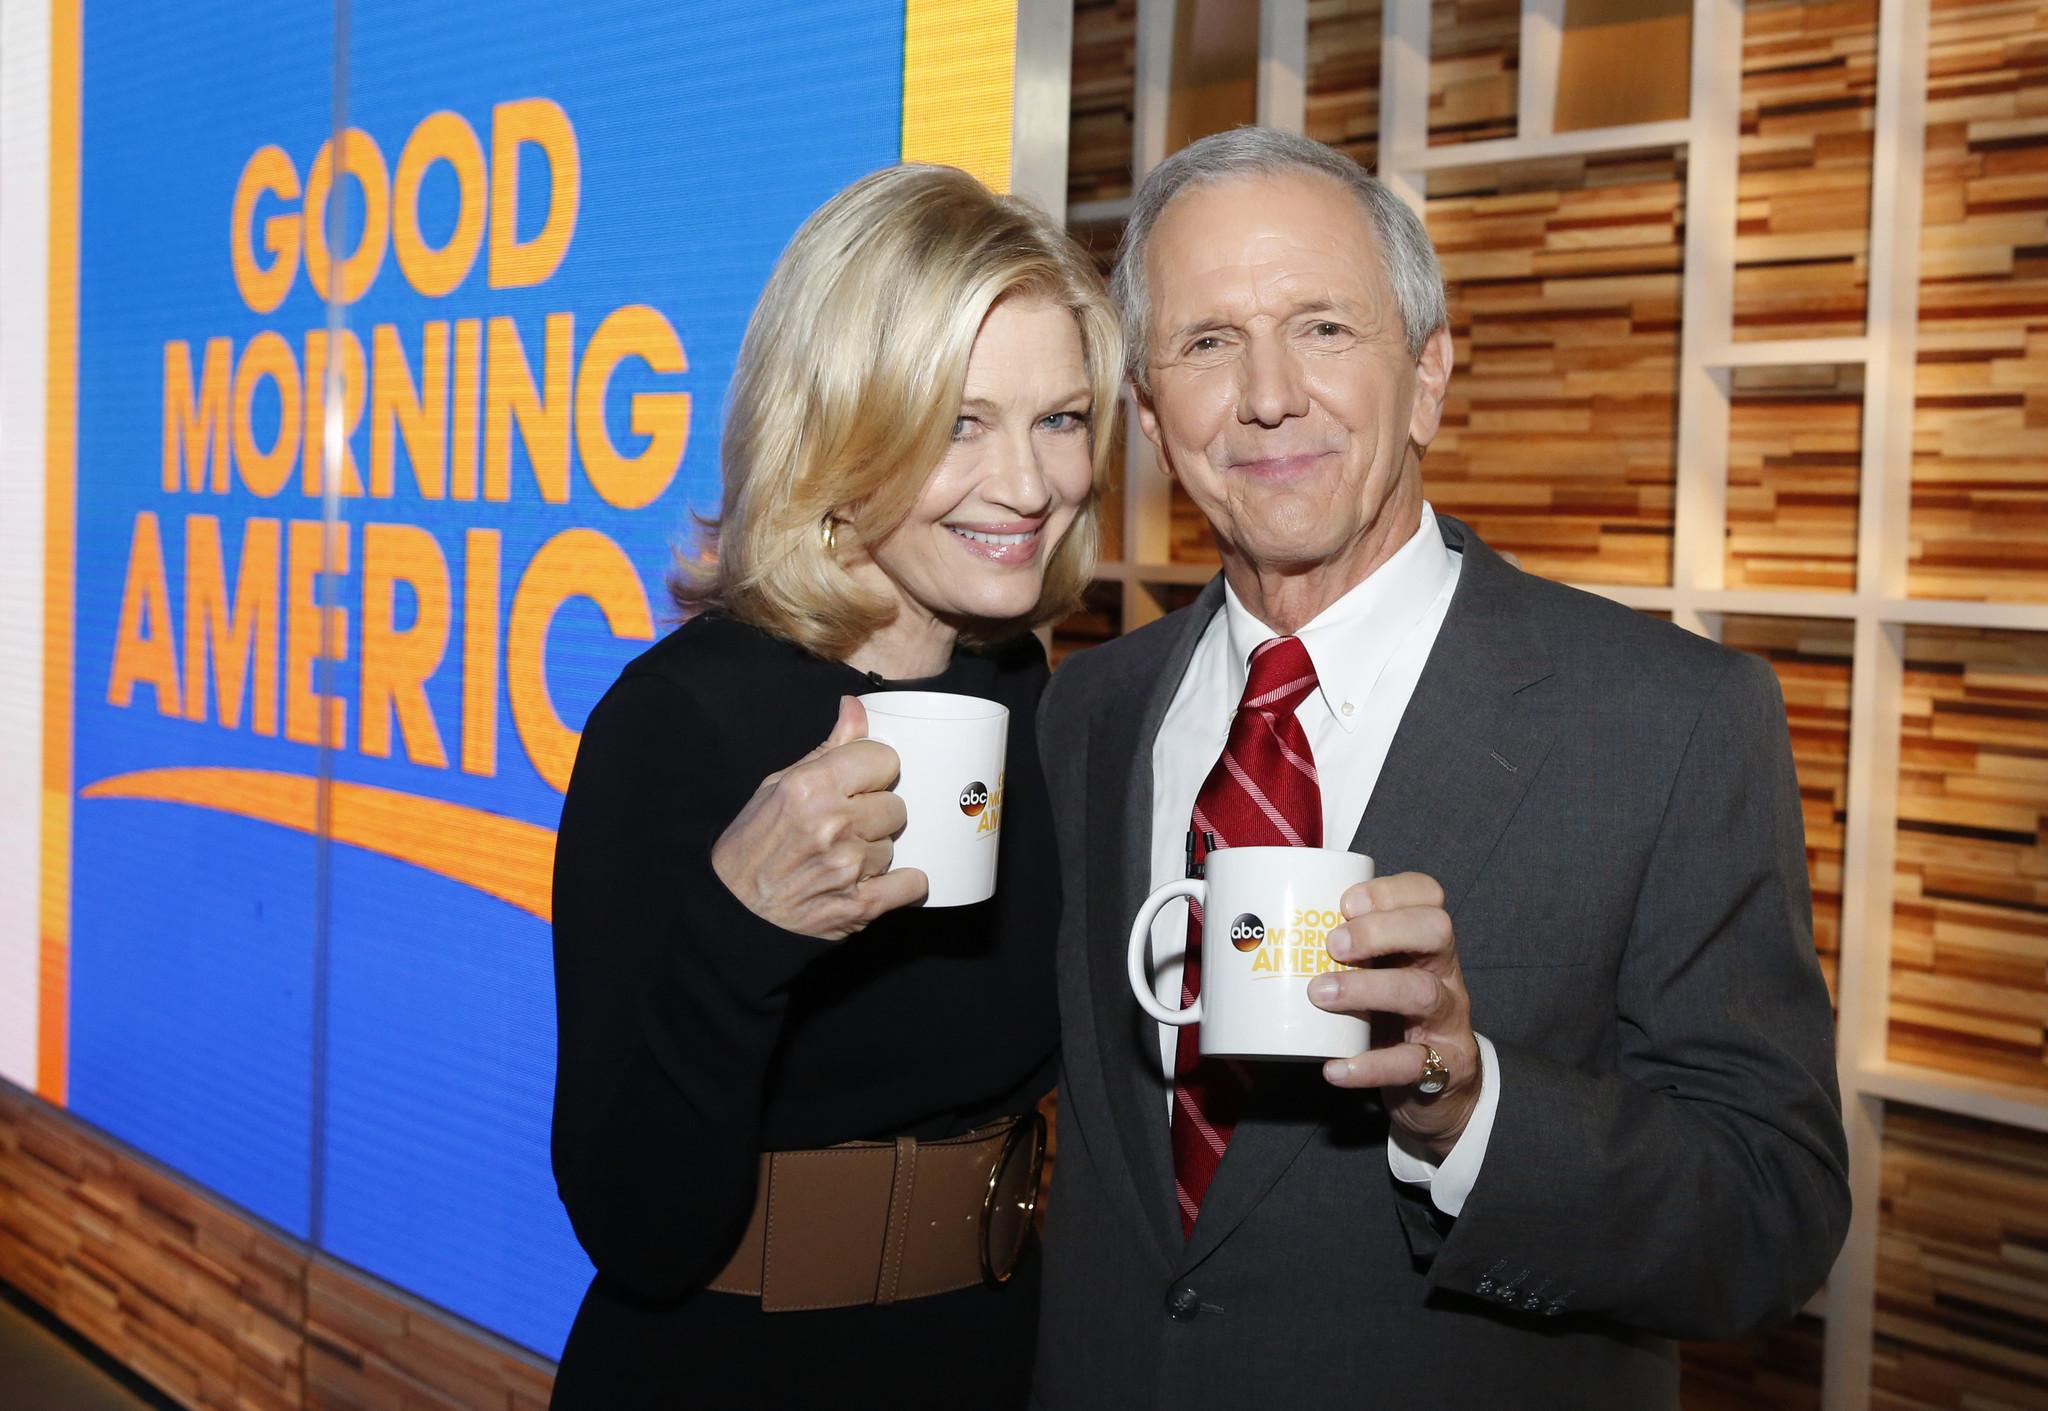 Good Morning America Former Hosts : Good morning america teams reunite for the program s